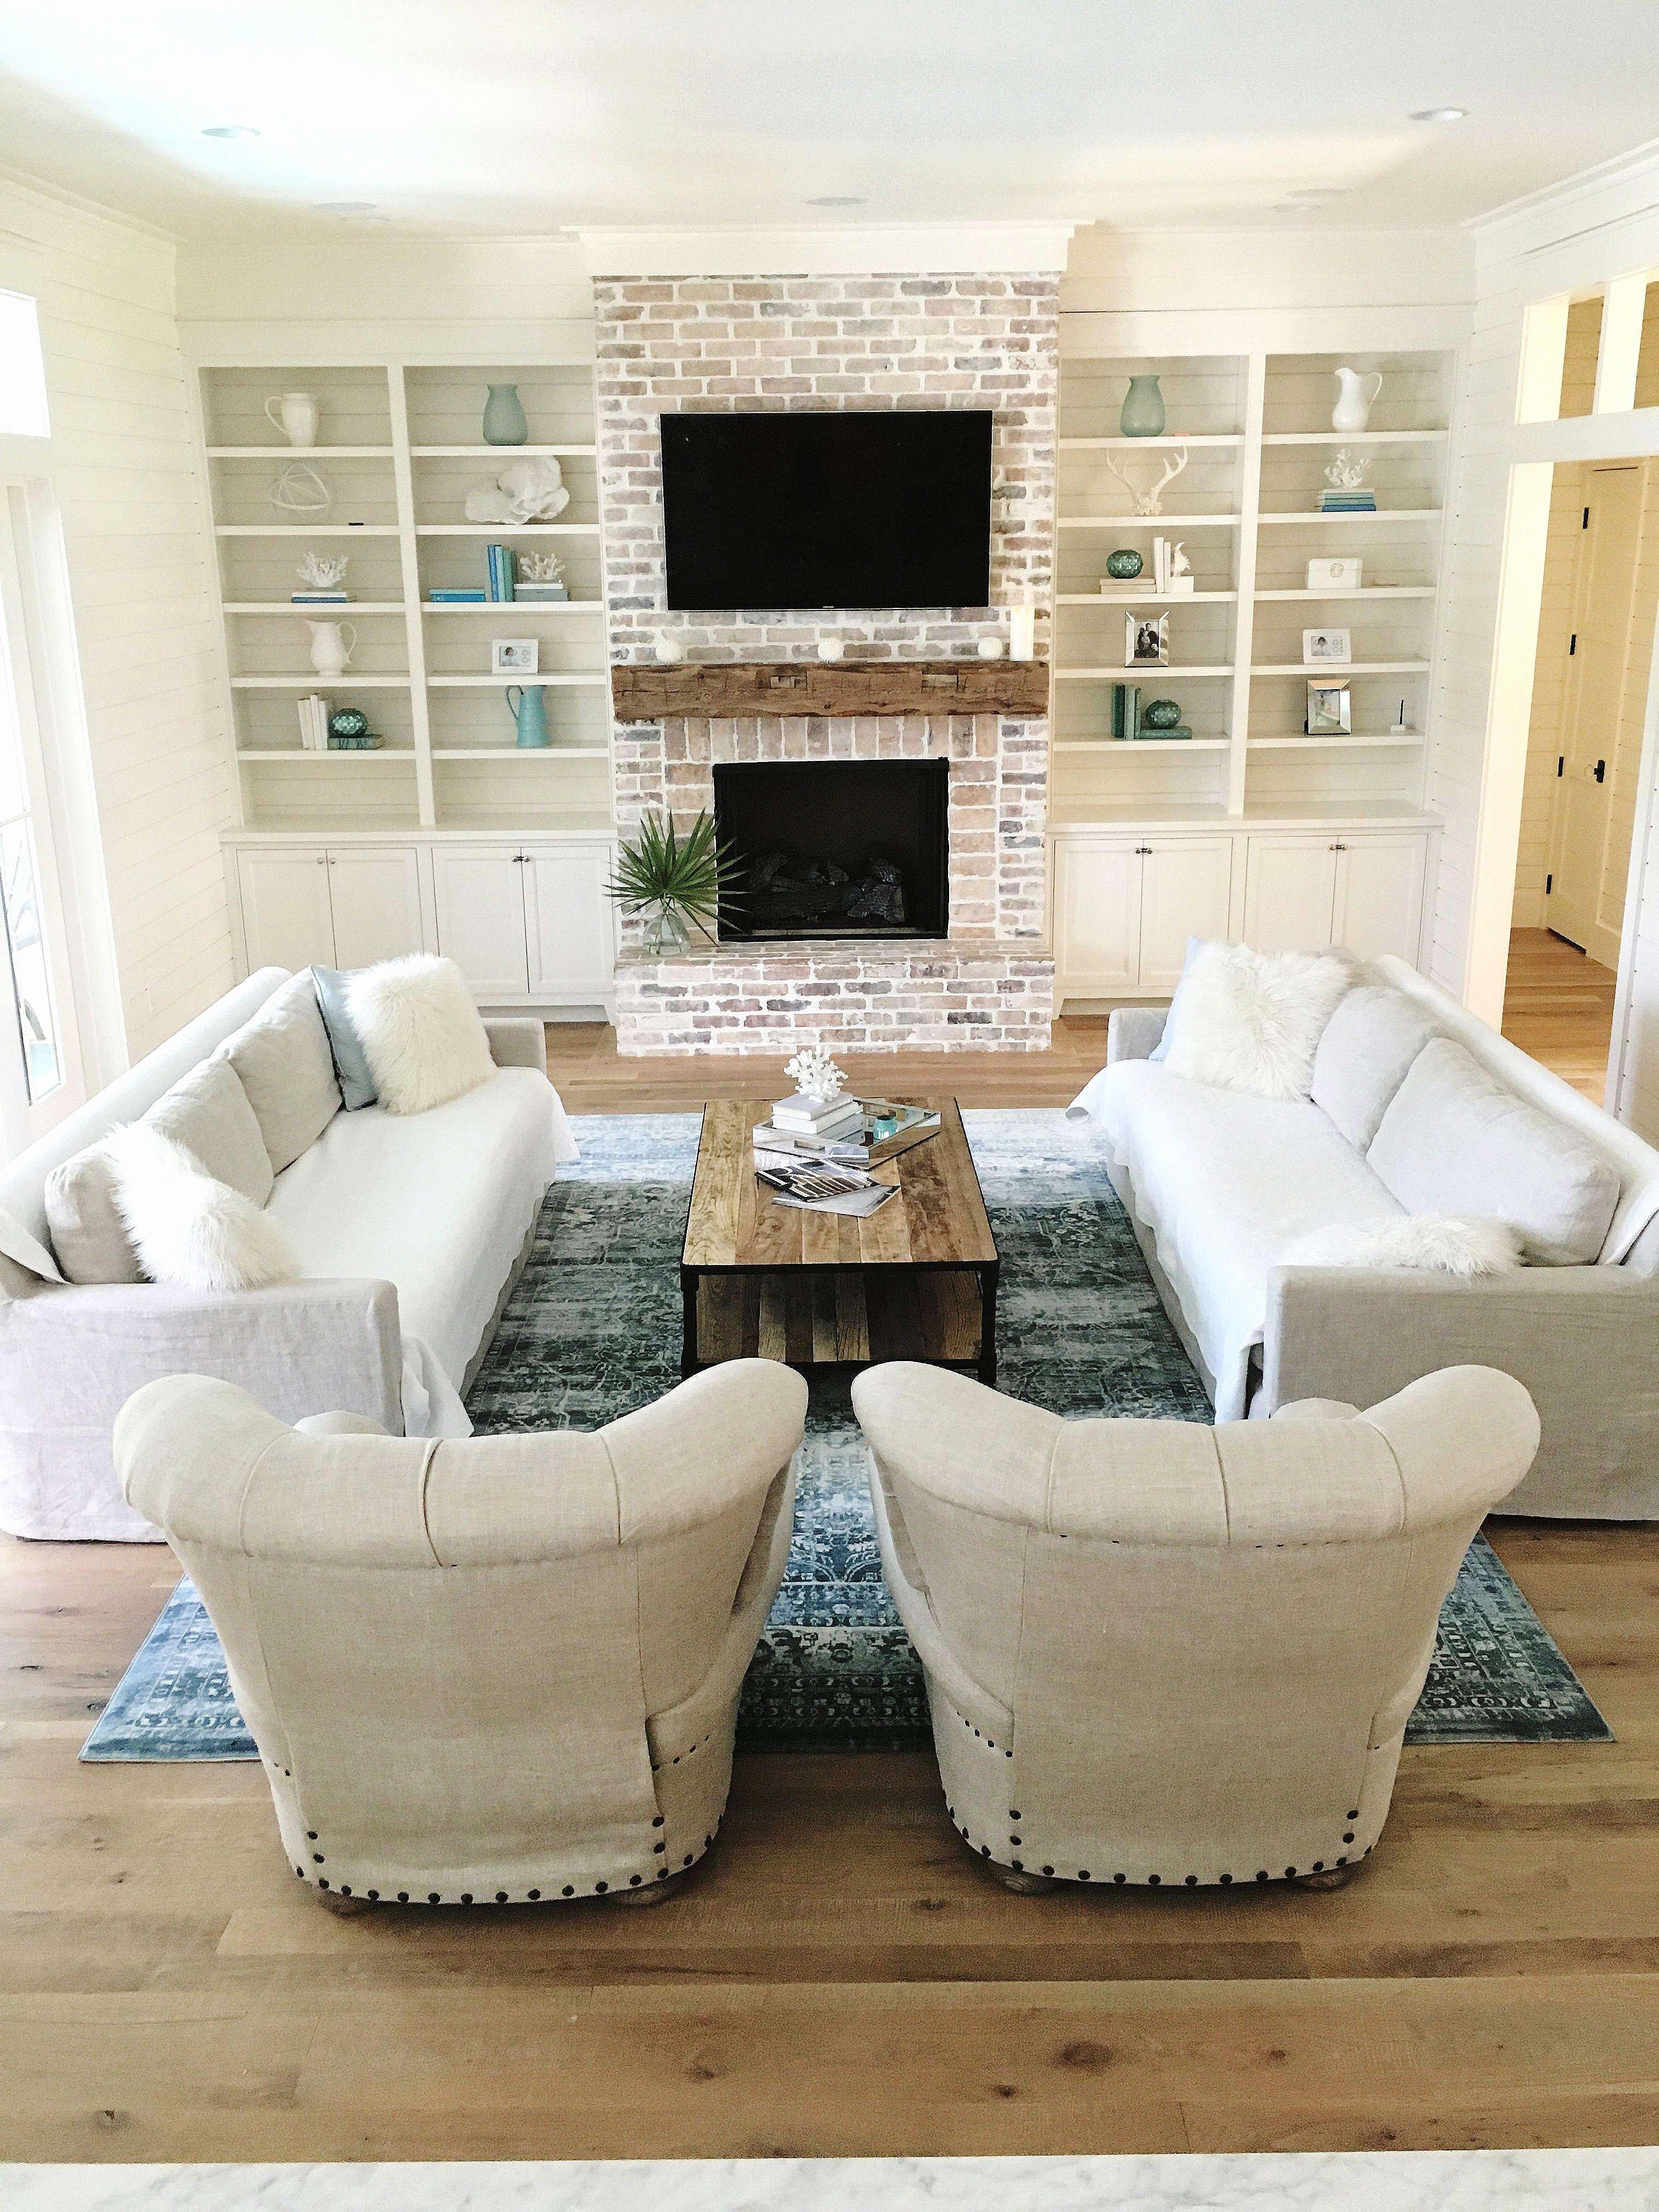 Wall Decals for Bedroom New 19 Trendy Home Decor Floor Vases